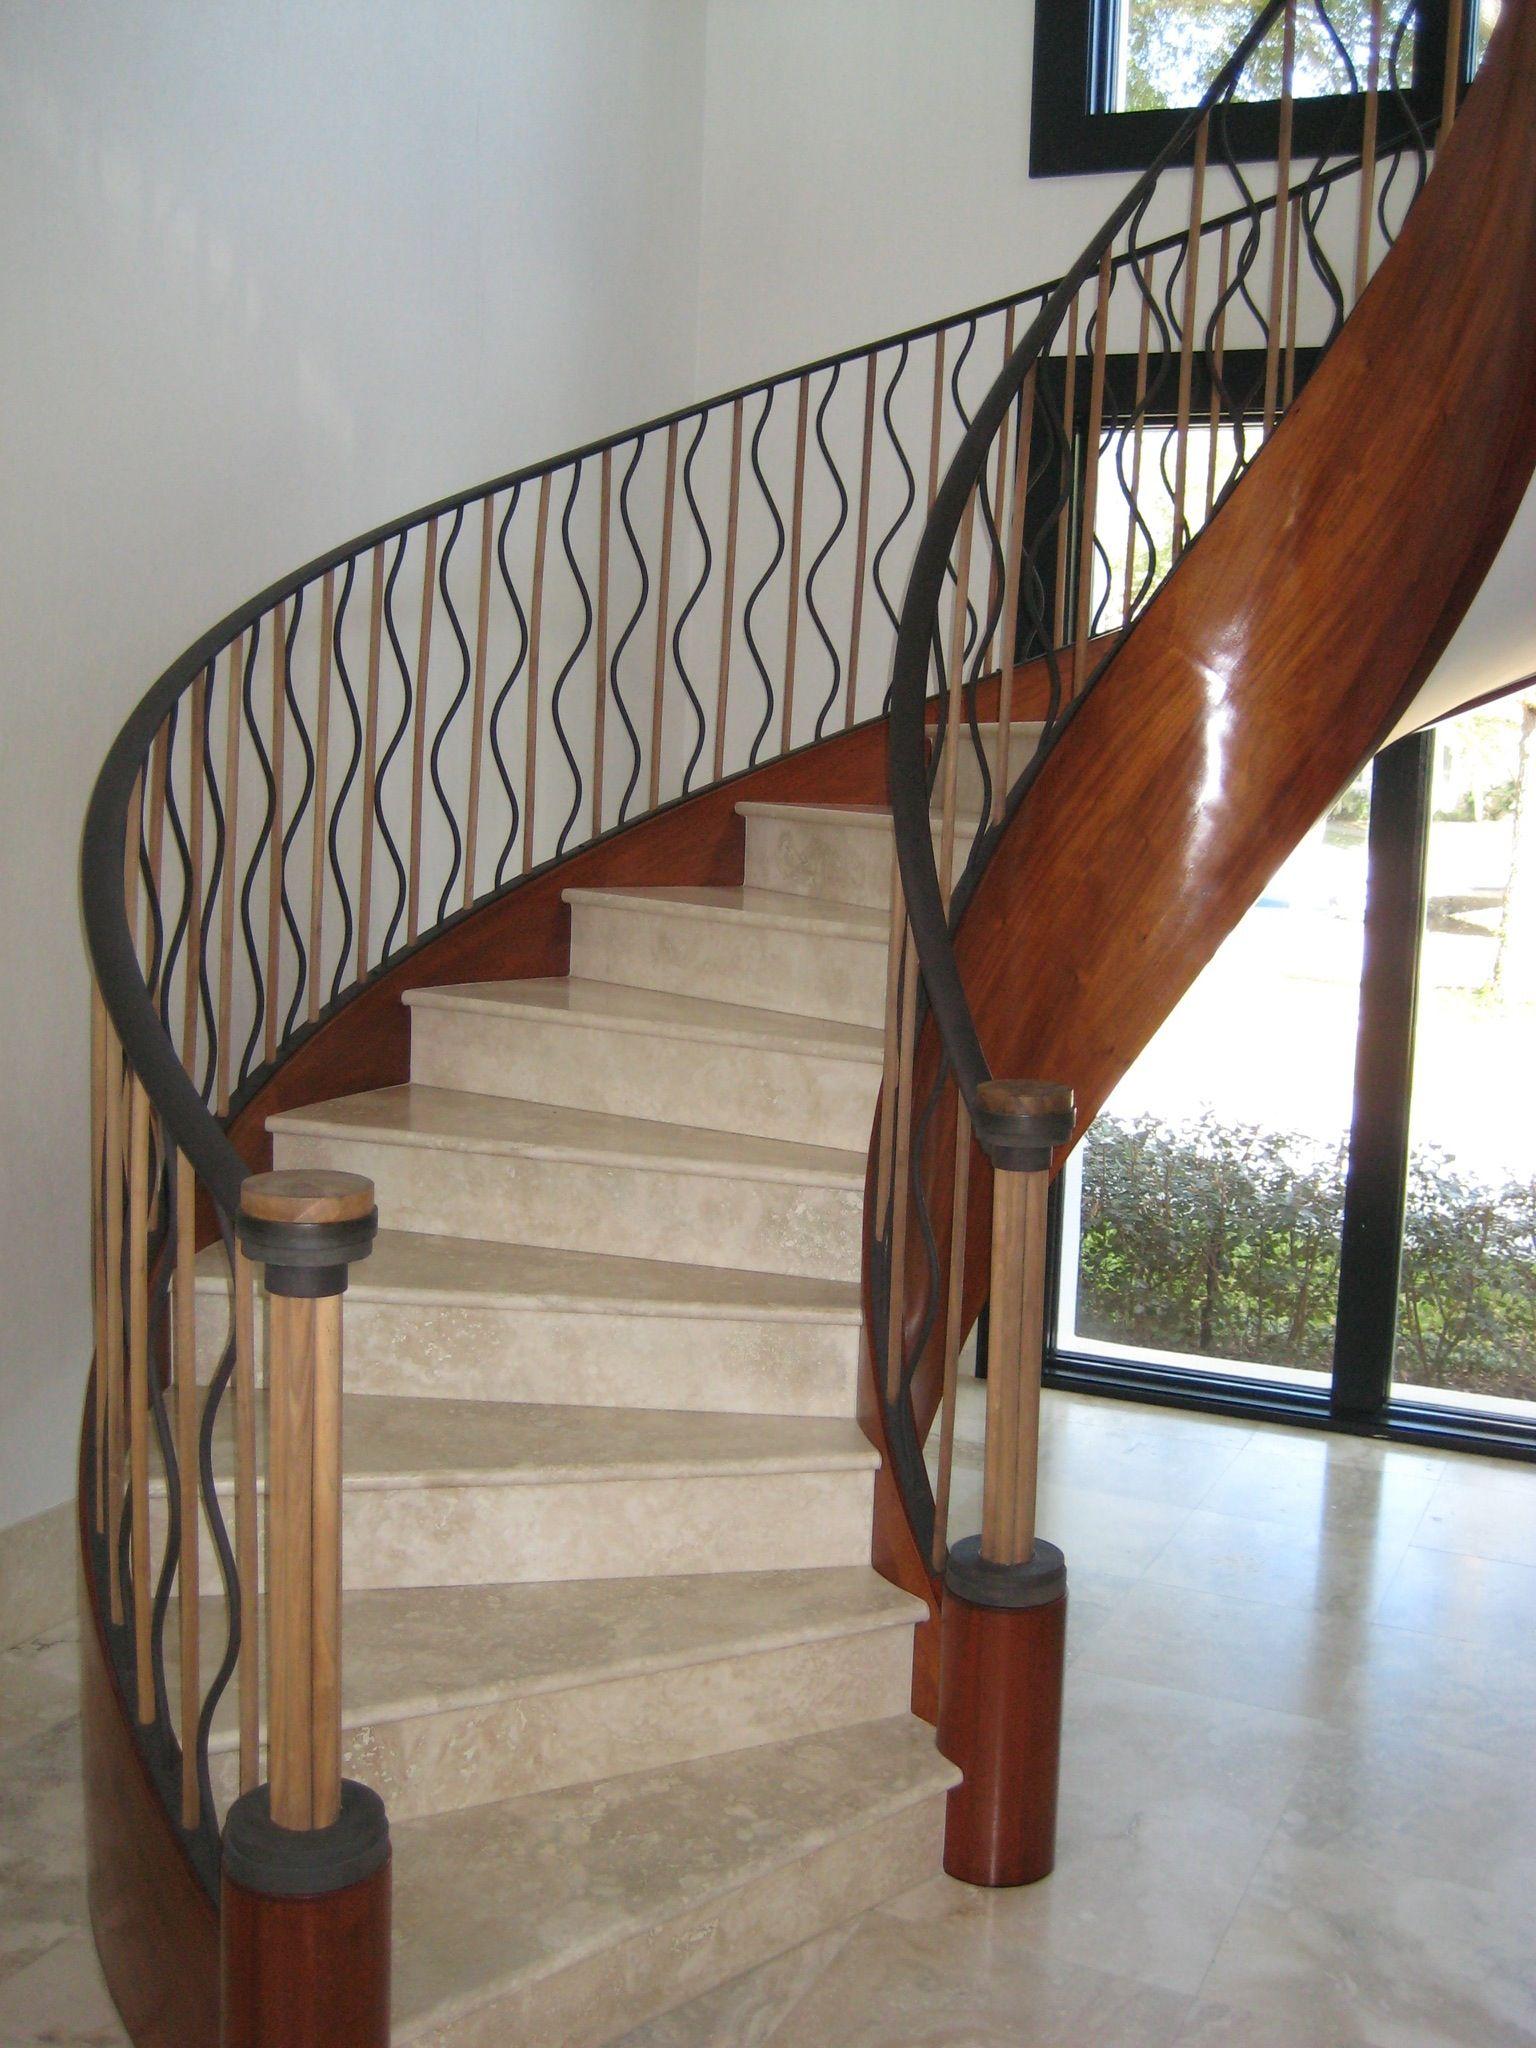 Iron Stair Railings Custom Iron Railing Jacksonville Classic | Custom Iron Stair Railing | Indoor | Steel | Metal | Curved | Ornamental